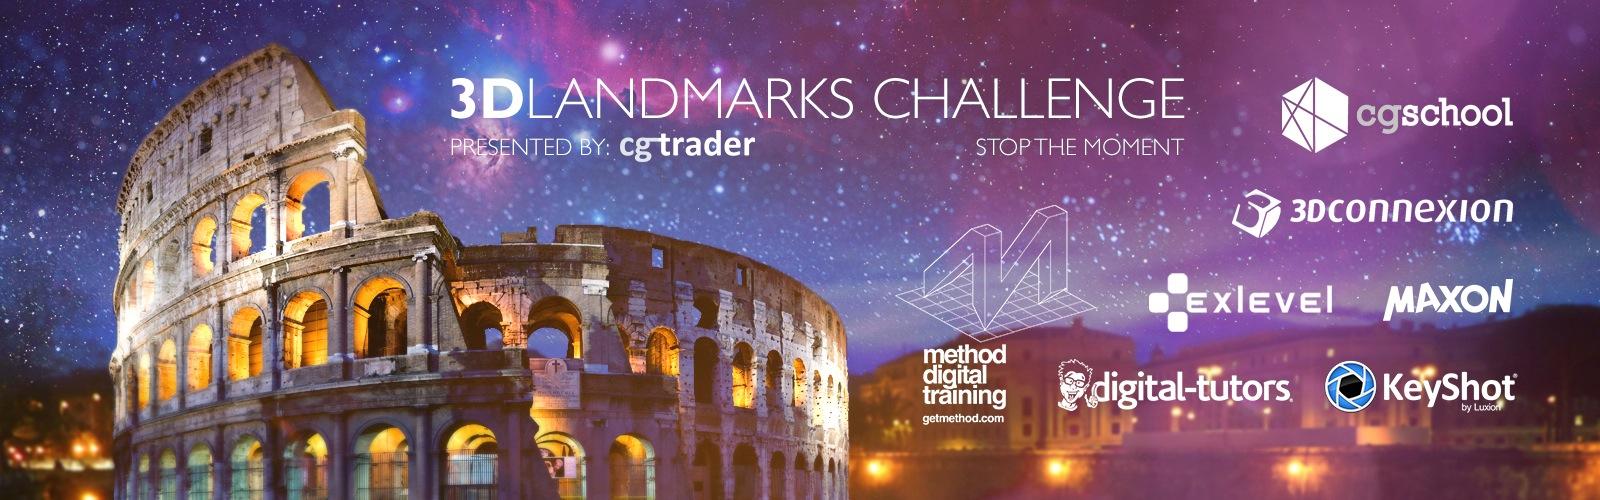 3D Landmark Challenge